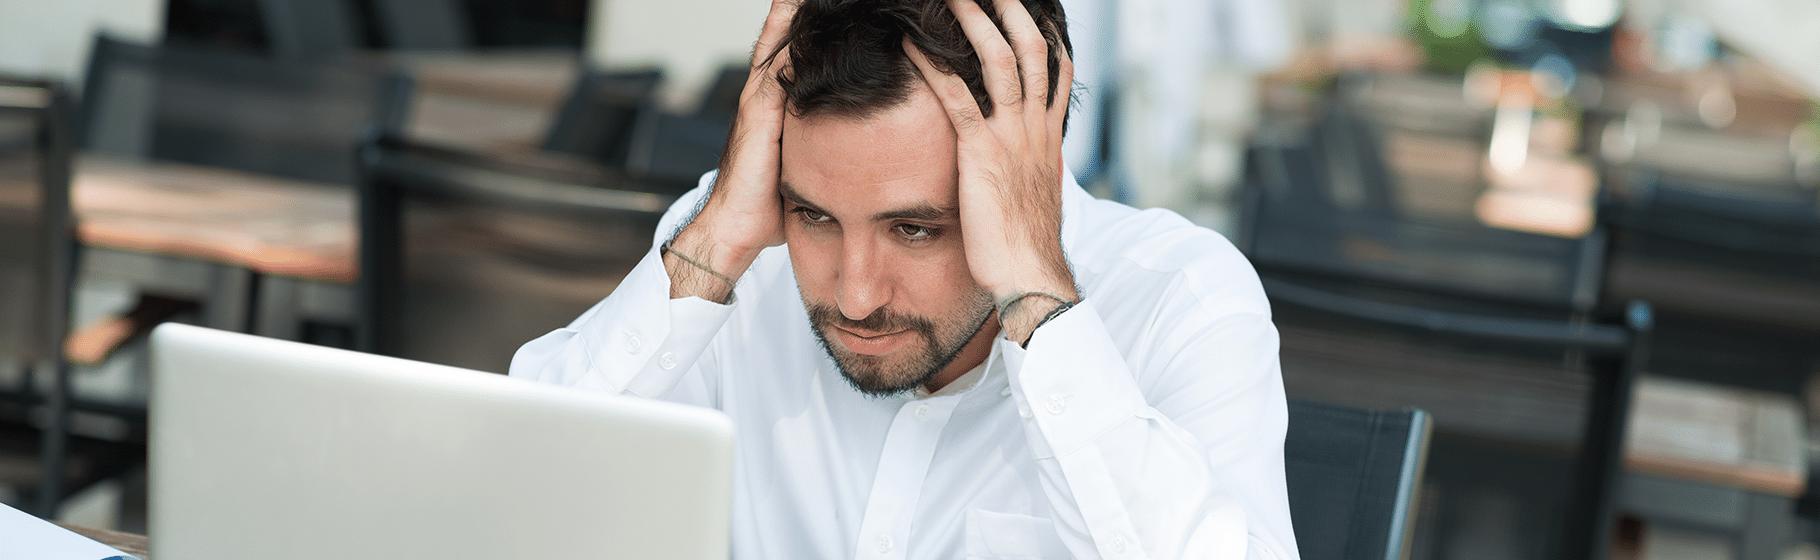 online klantenservice (resized)